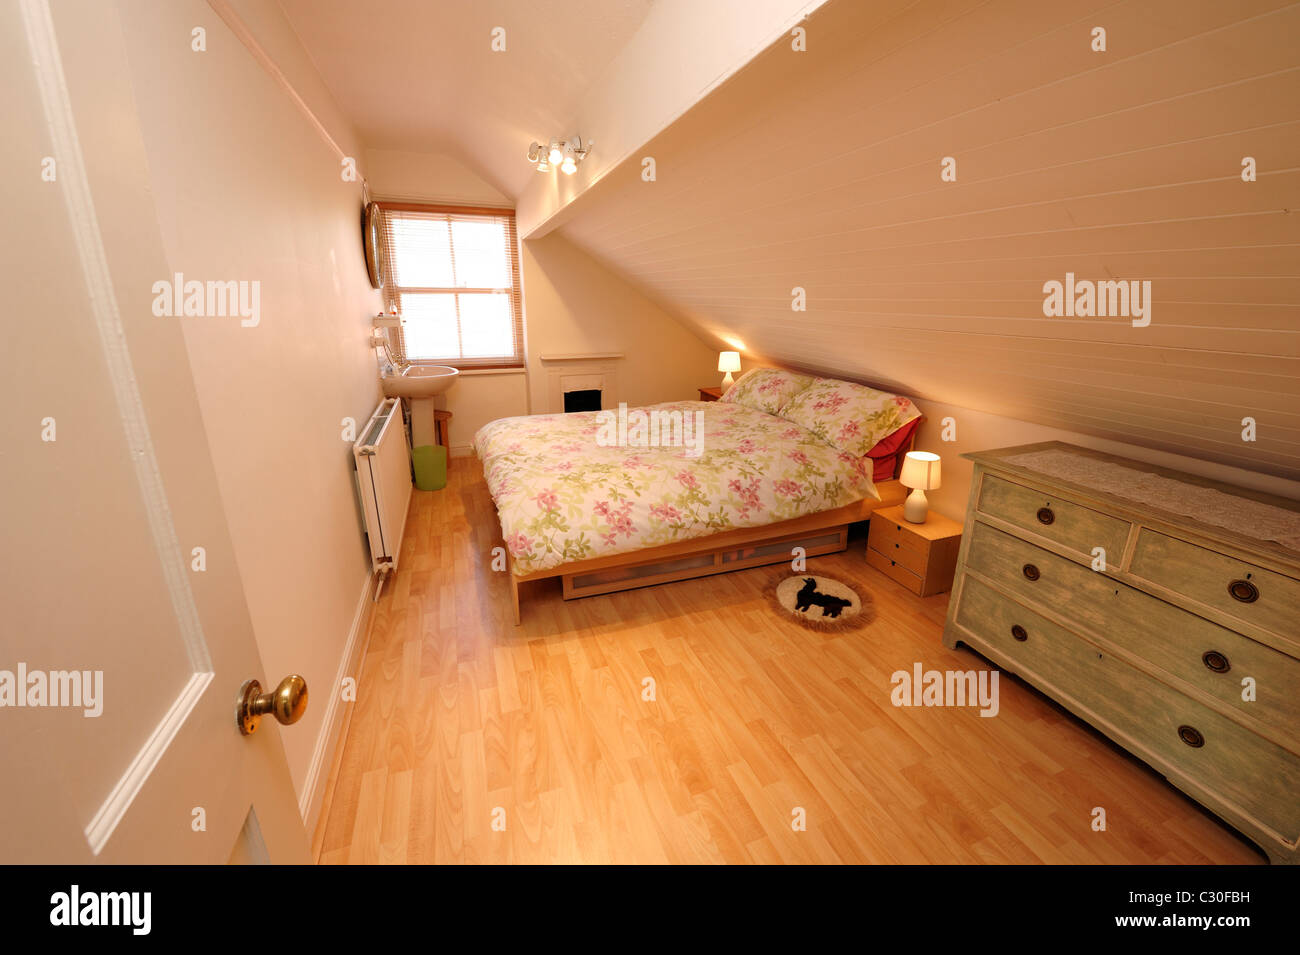 Conversión de loft moderno dormitorio Imagen De Stock